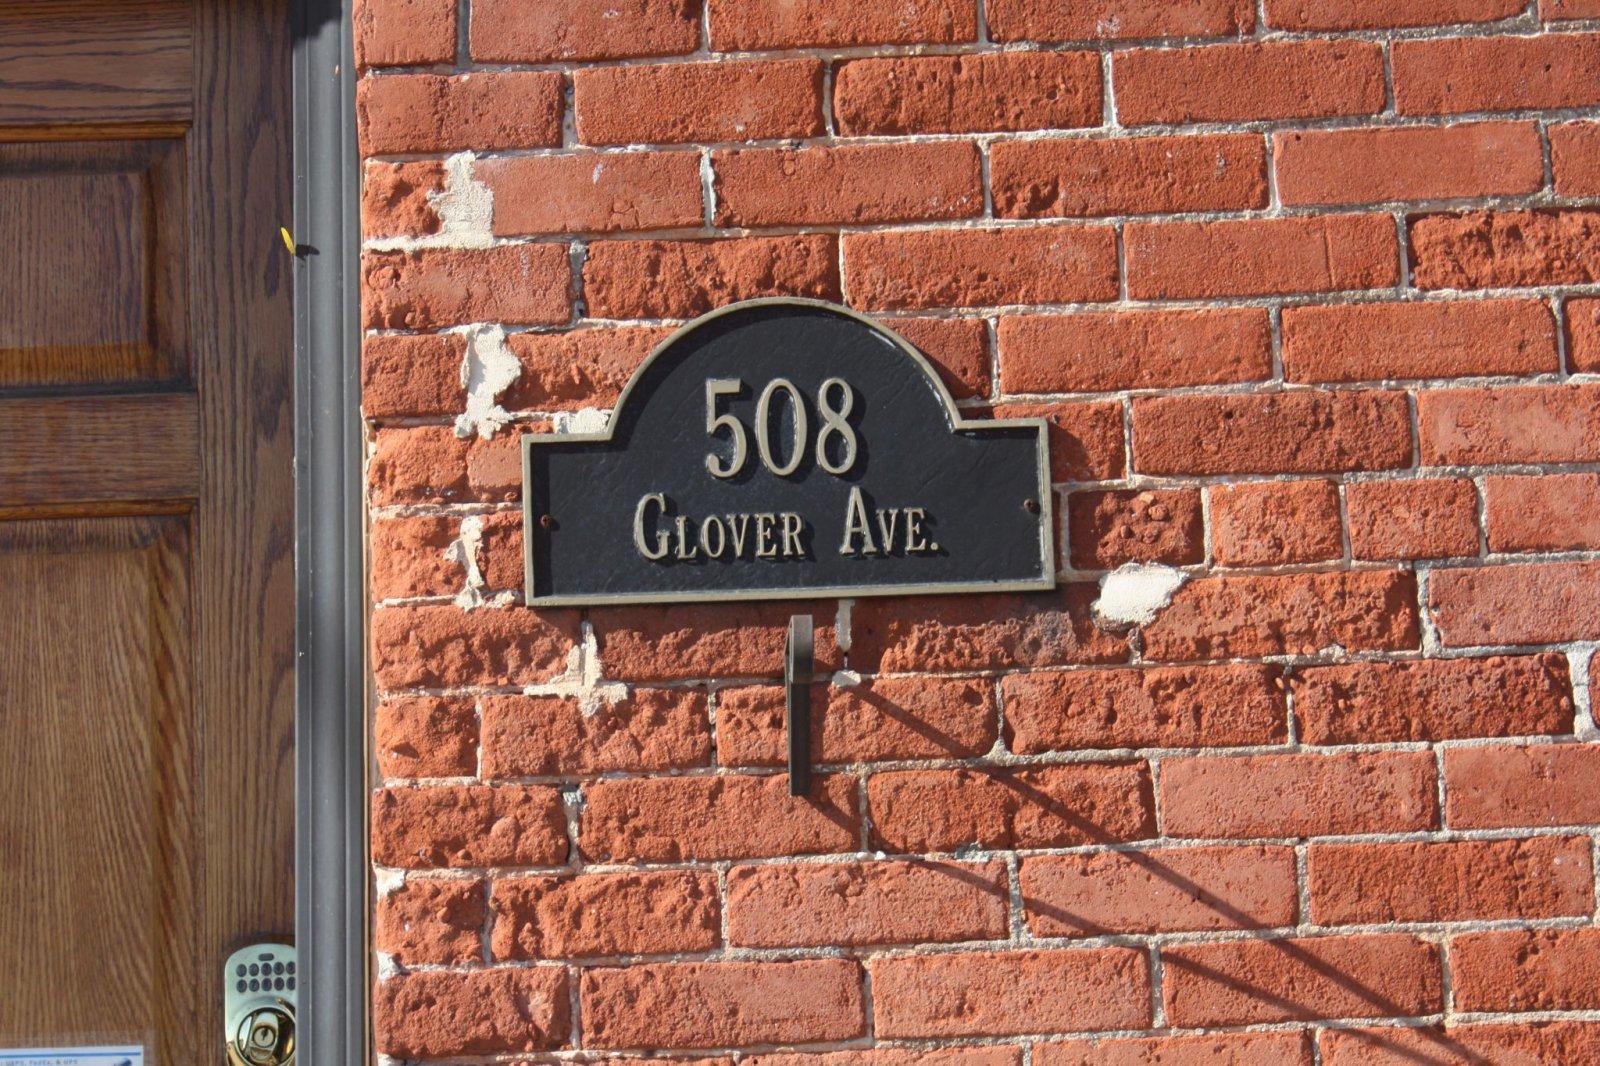 Glover Avenue address plate